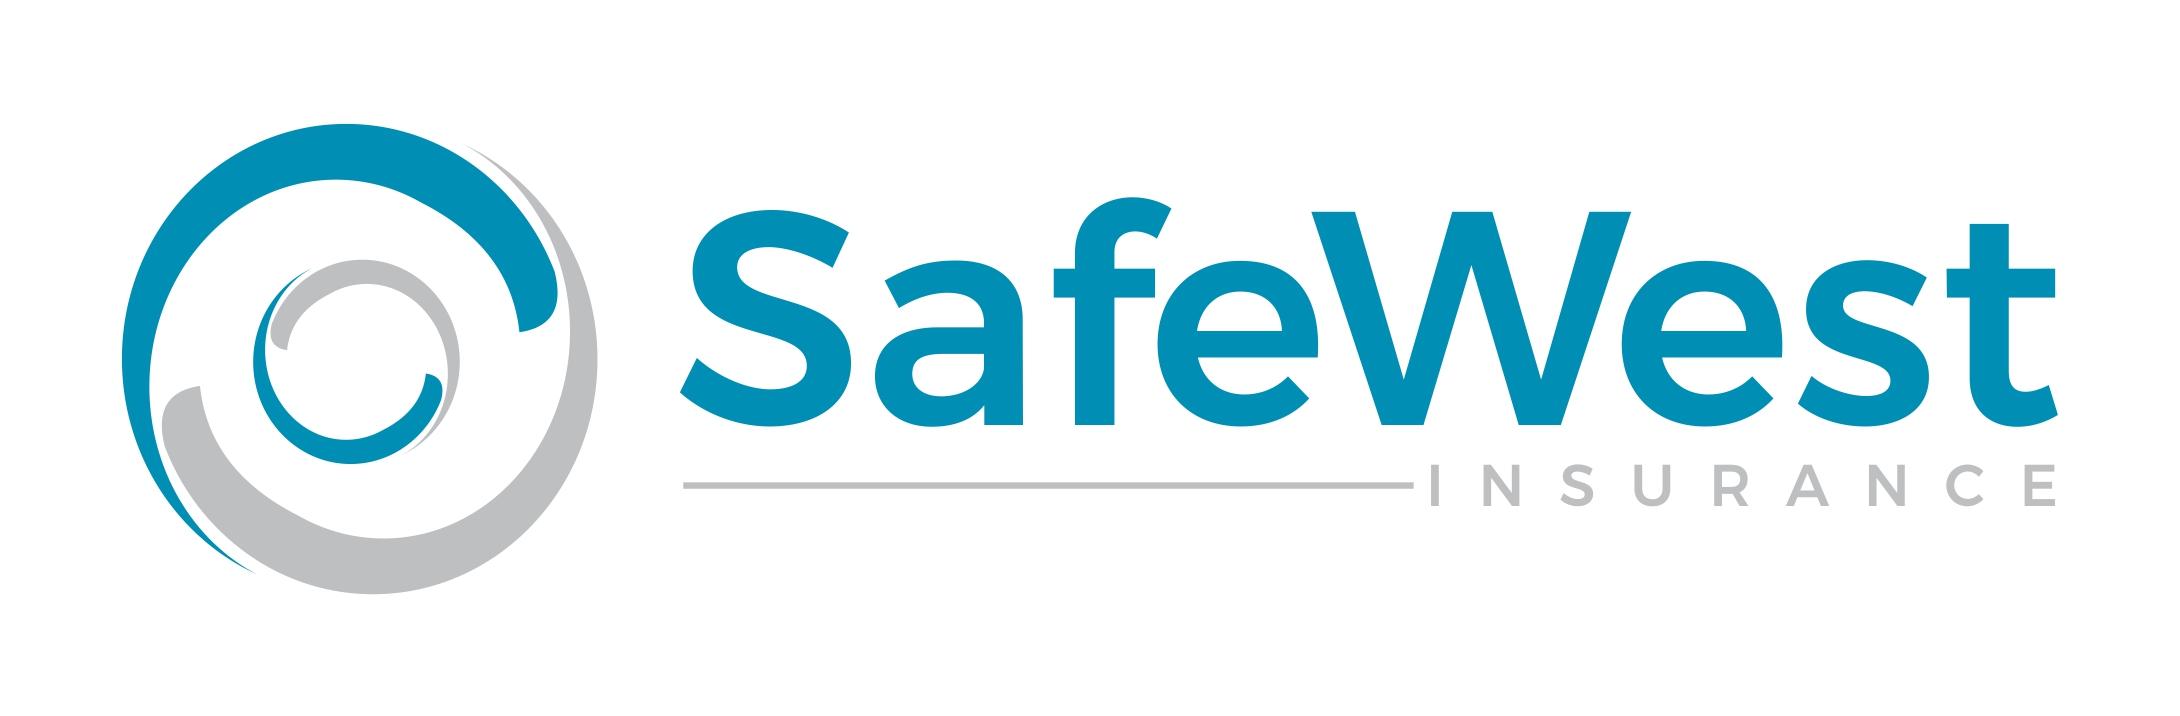 SafeWest Insurance Best